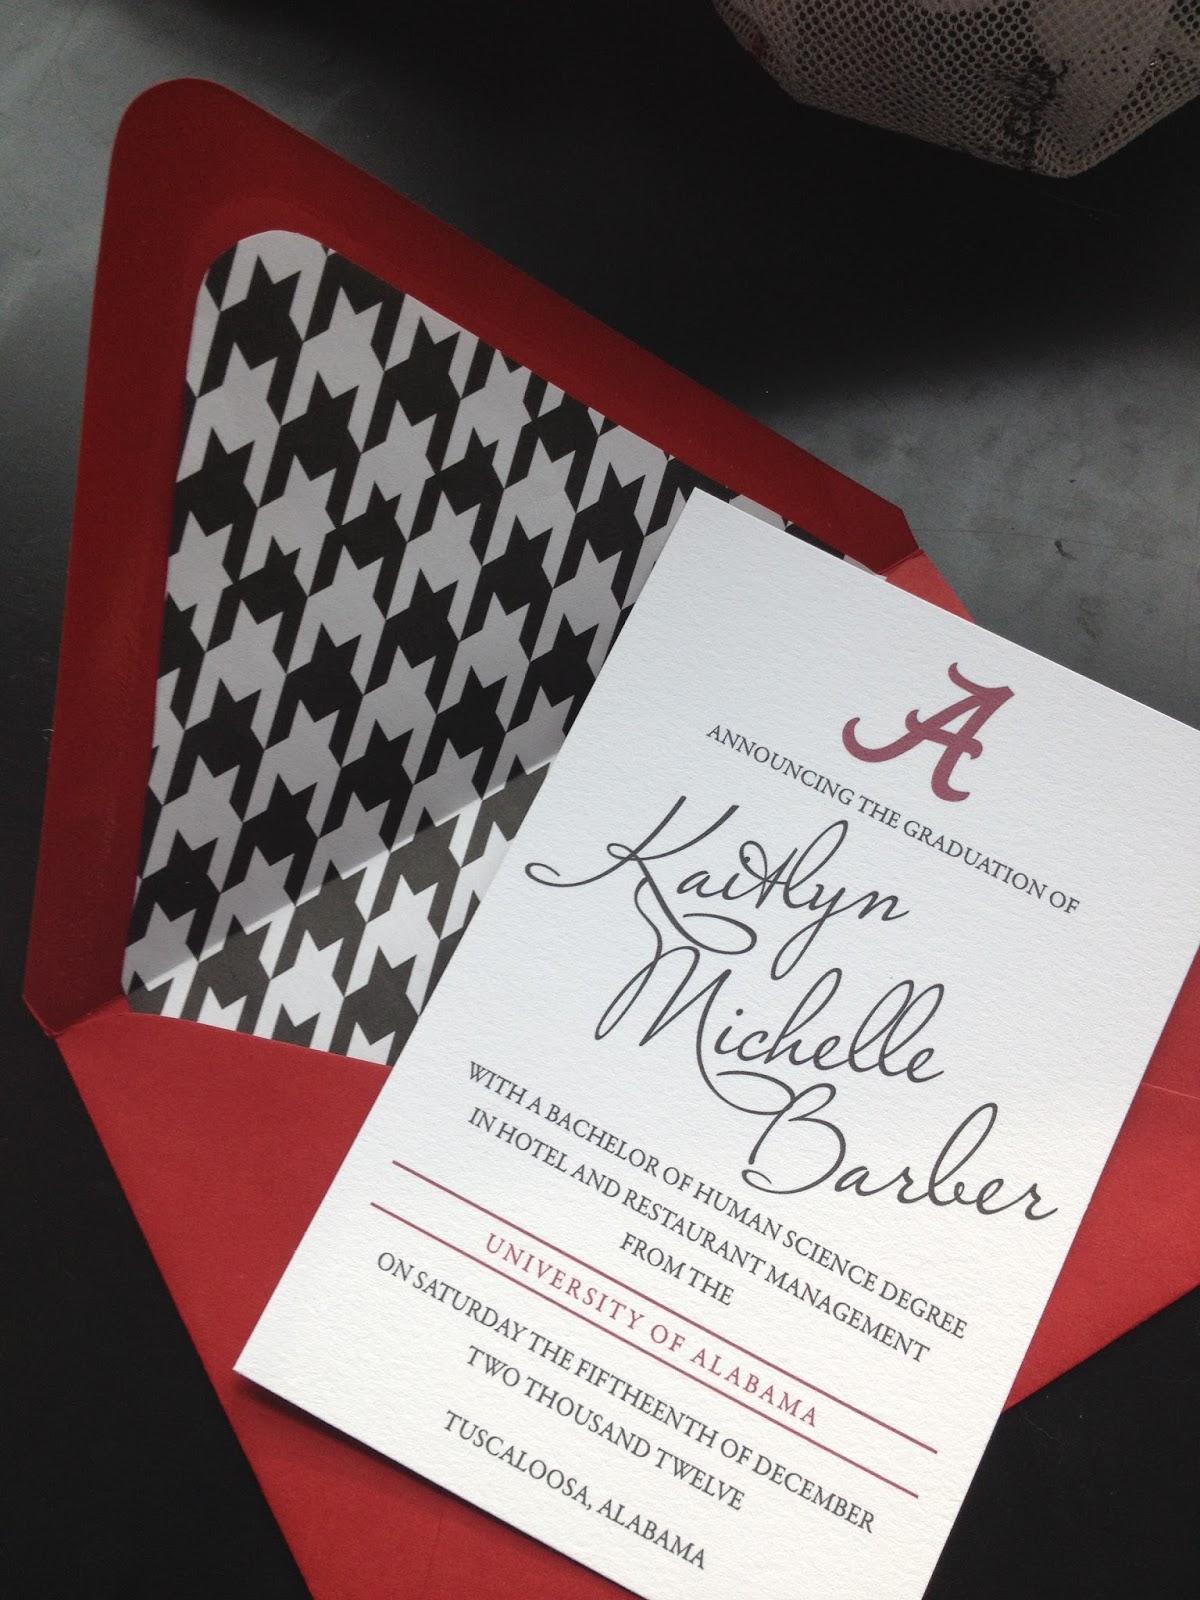 grad+announcement+1 bellefonte press alabama graduation announcements,Graduation Invitation Envelopes